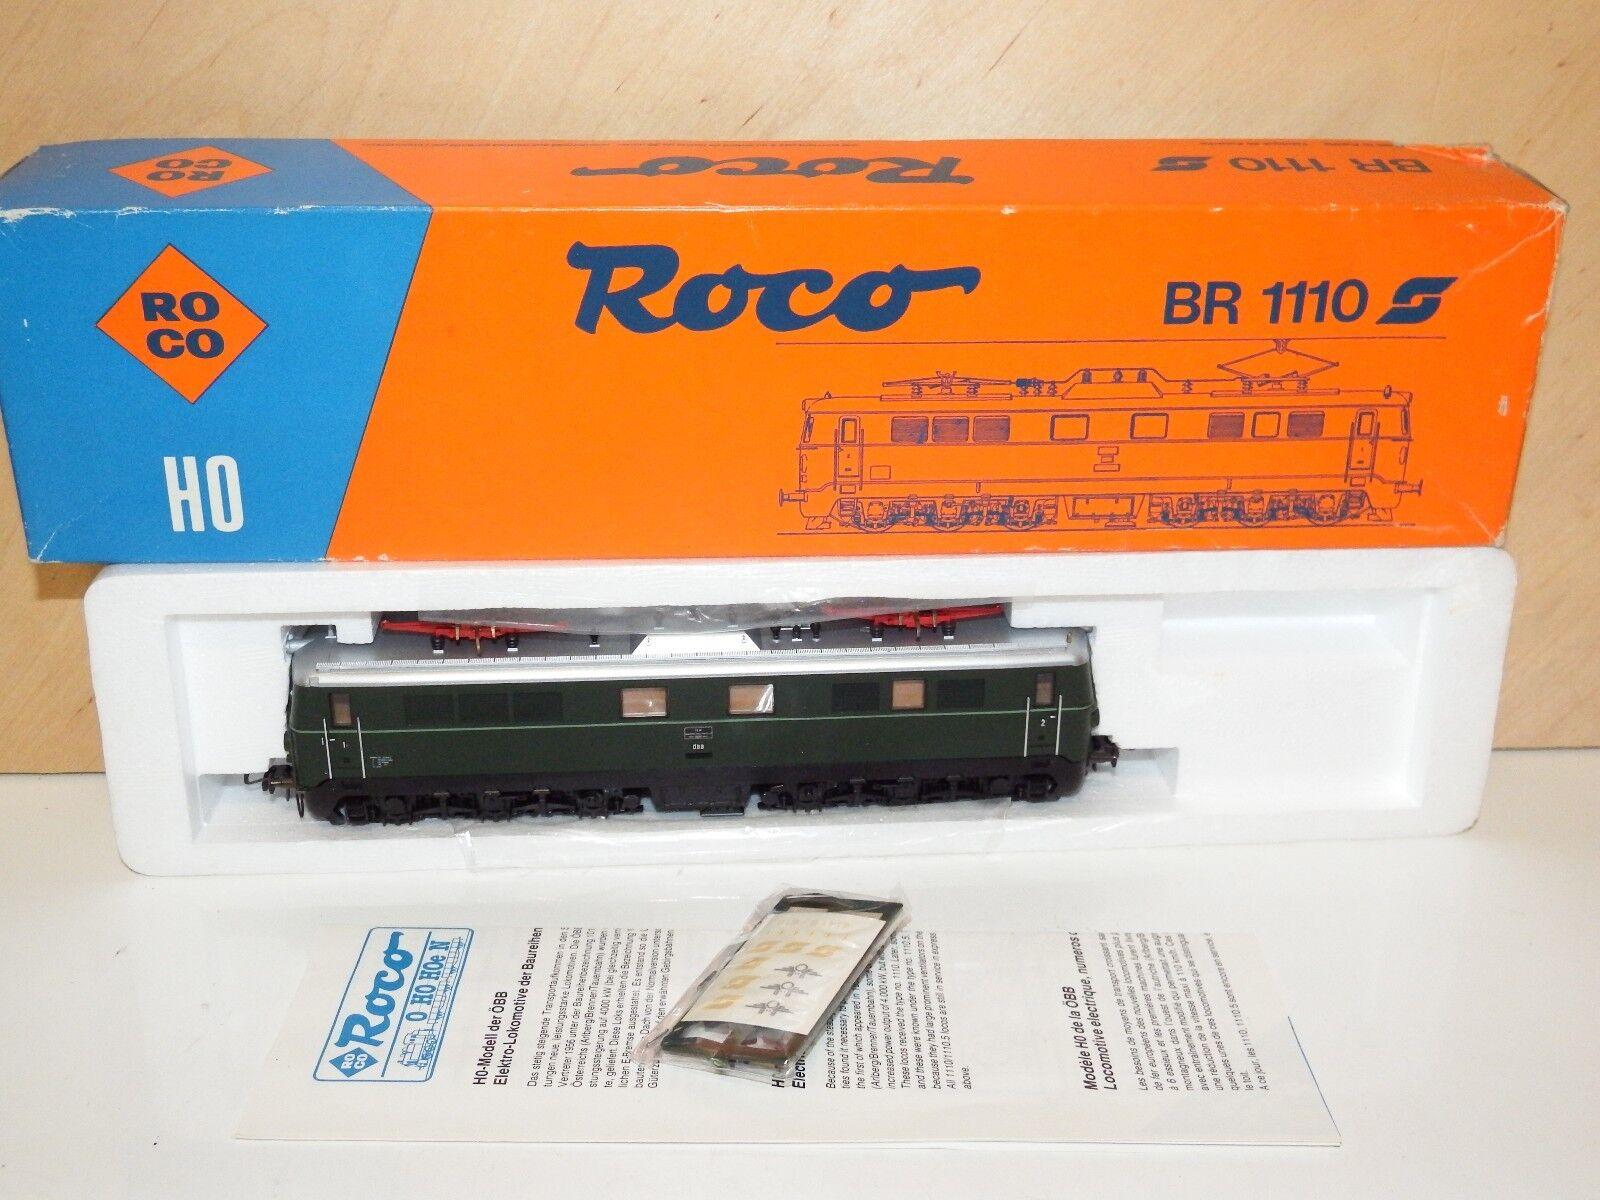 H0 Roco 04198a elekrolok ÖBB BR 1110 Original Box Mint 4037